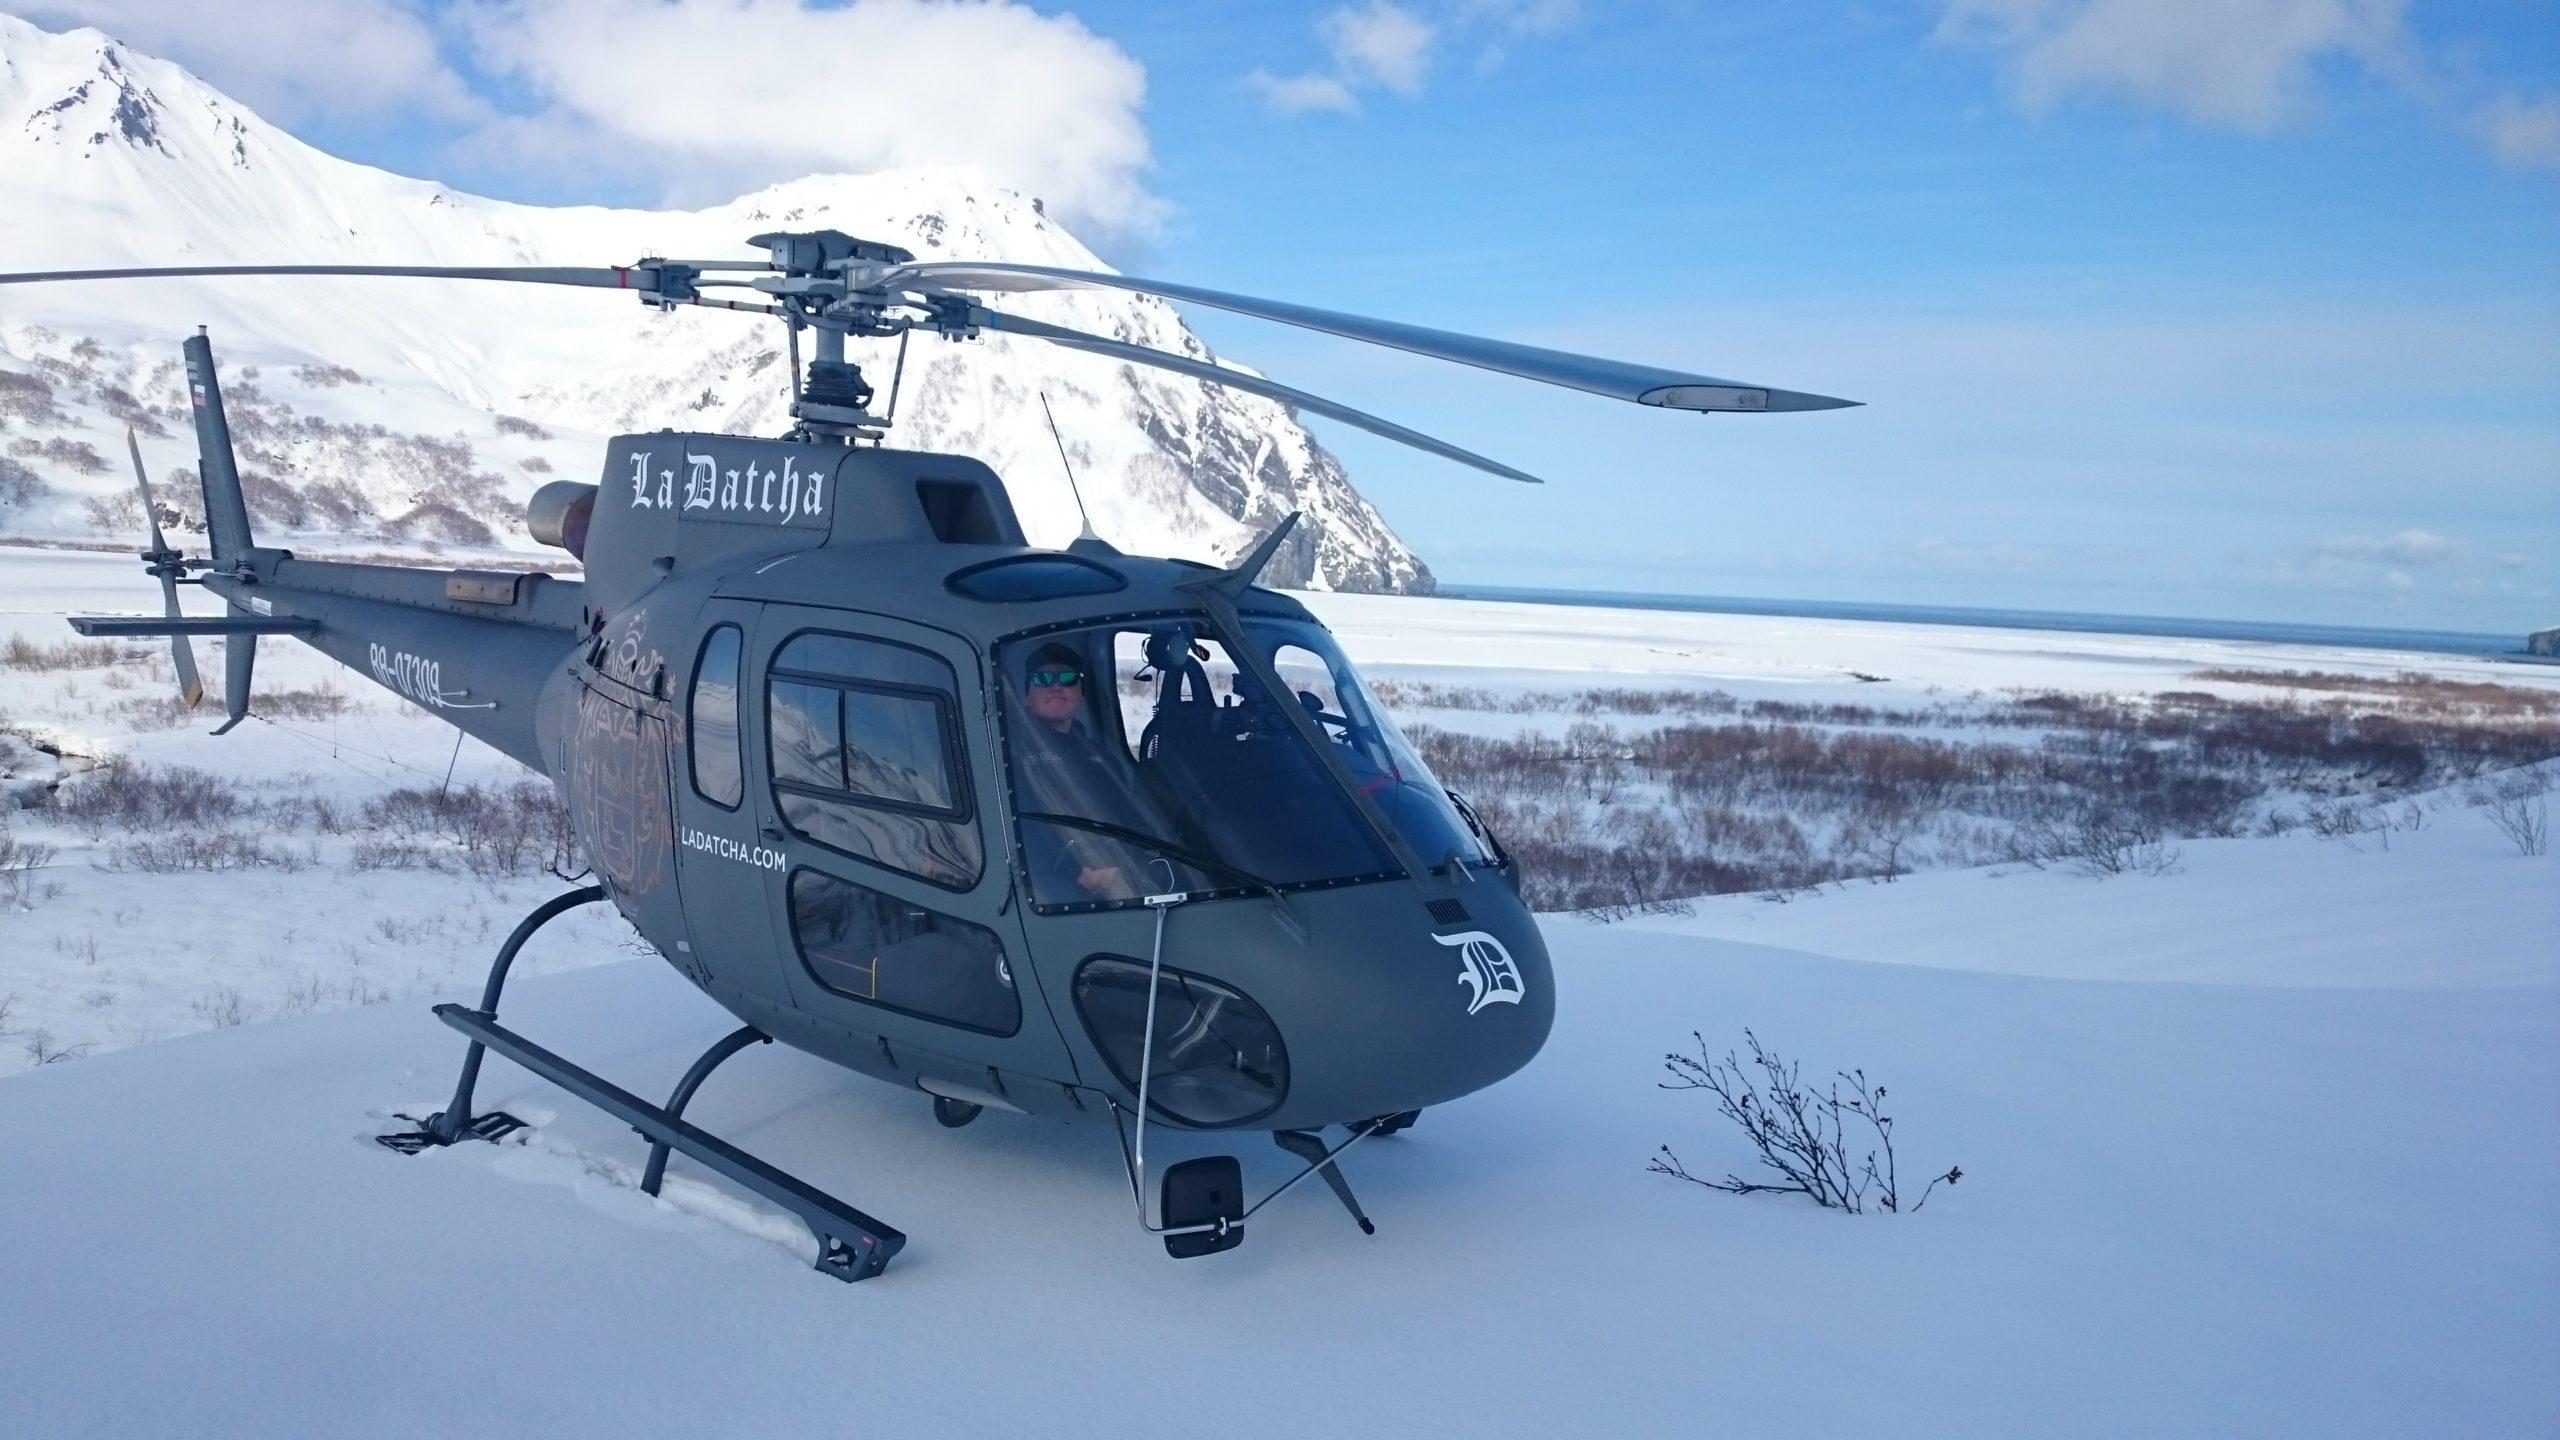 Tchoukotka-Kamchatka-La-Datcha-Heliski-Russia-1-scaled